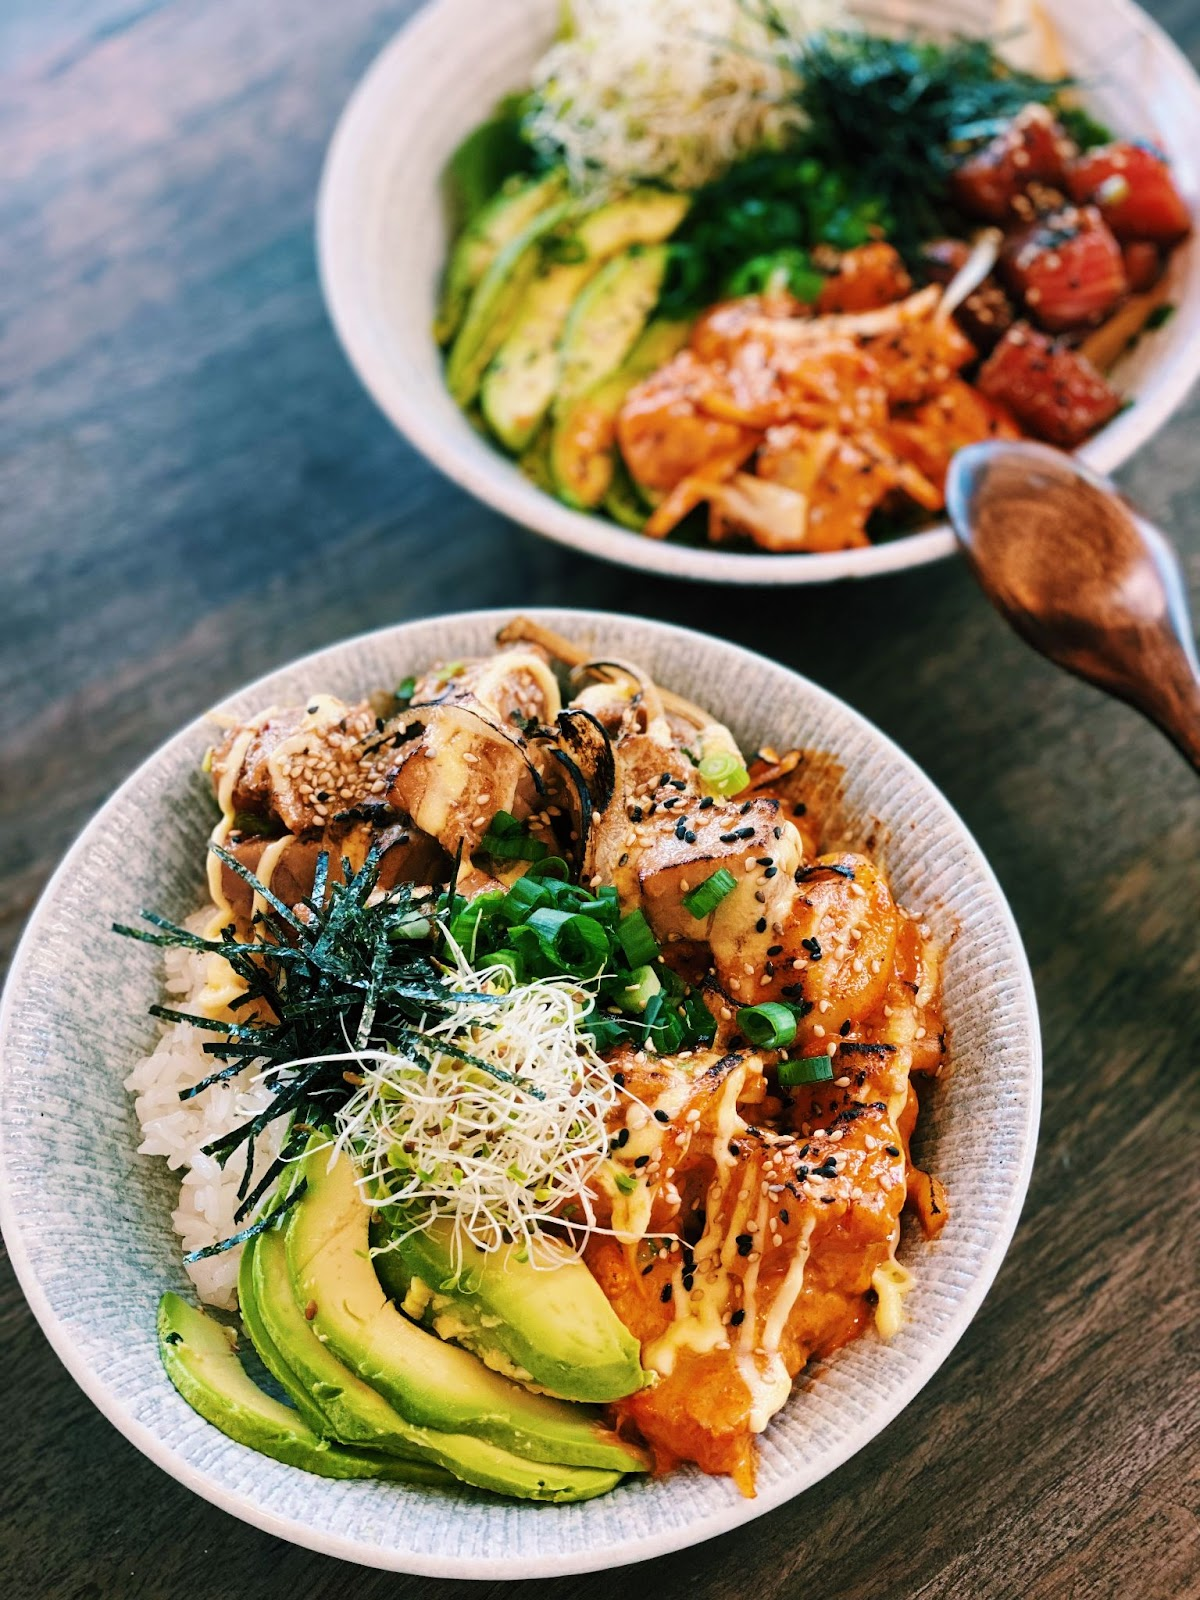 Poke Bowl - Spicy Creamy Ahi Tuna and Shoyu Tuna